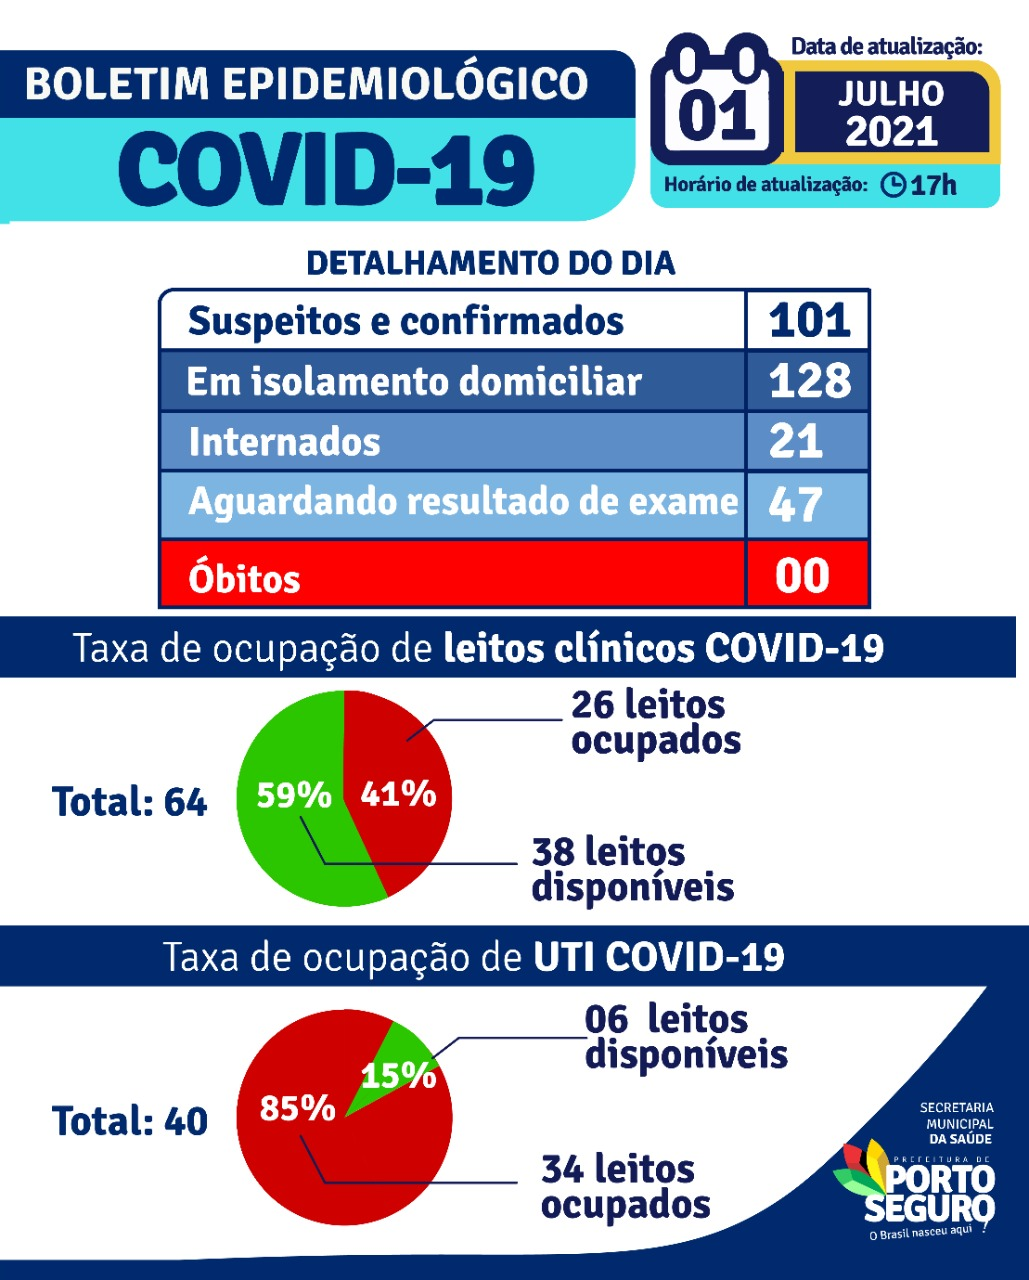 Porto Seguro: Boletim Epidemiológico Covid-19 (01/Julho) 22